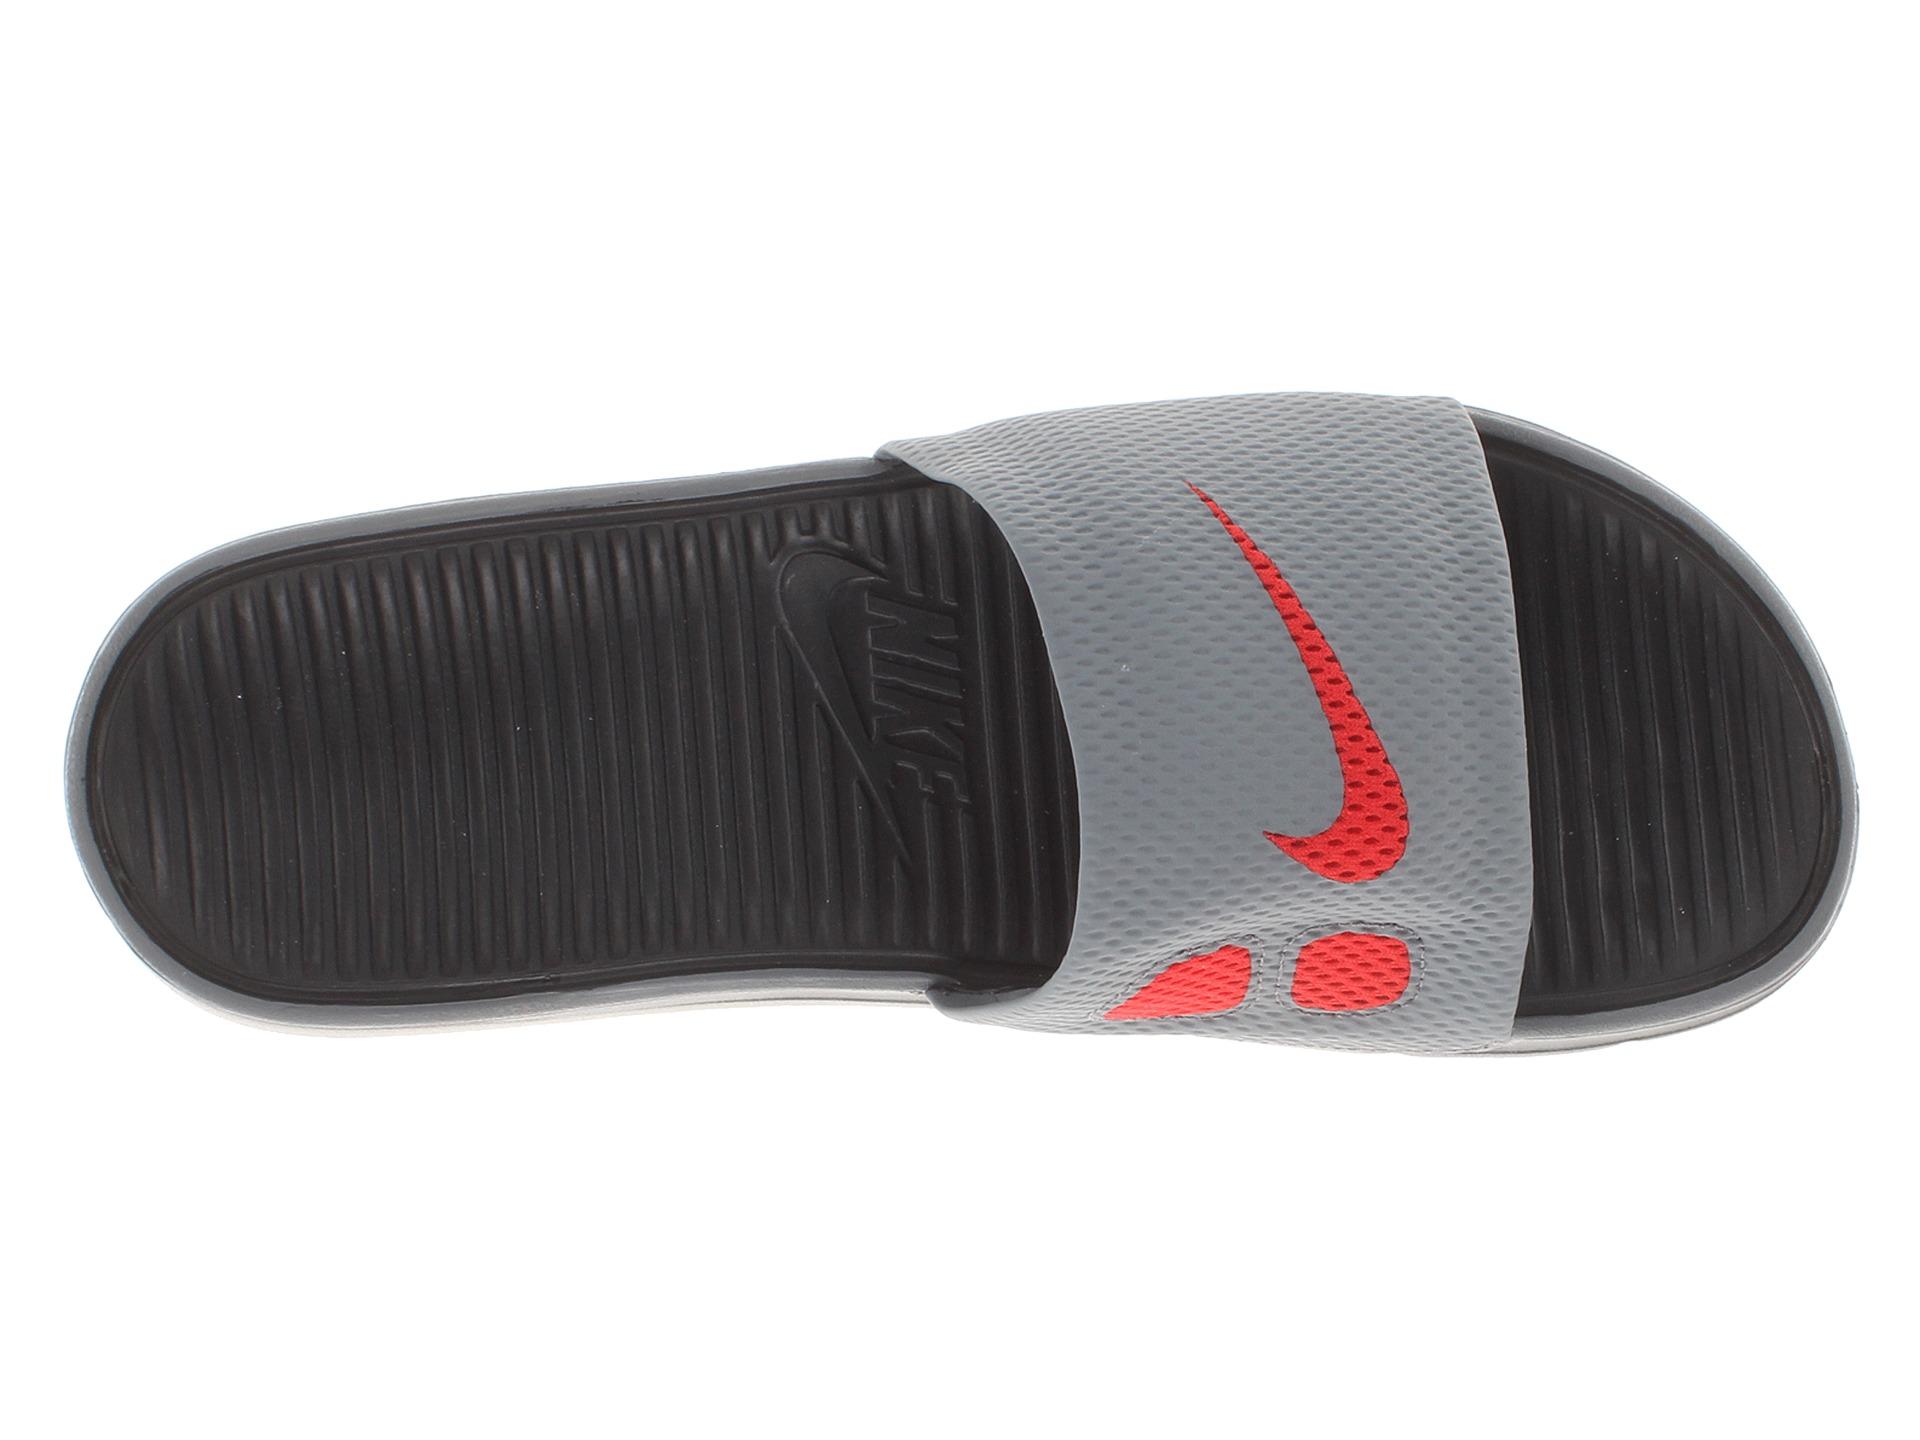 a62048479 Nike Benassi Solarsoft Slide Cool Grey Black University Red